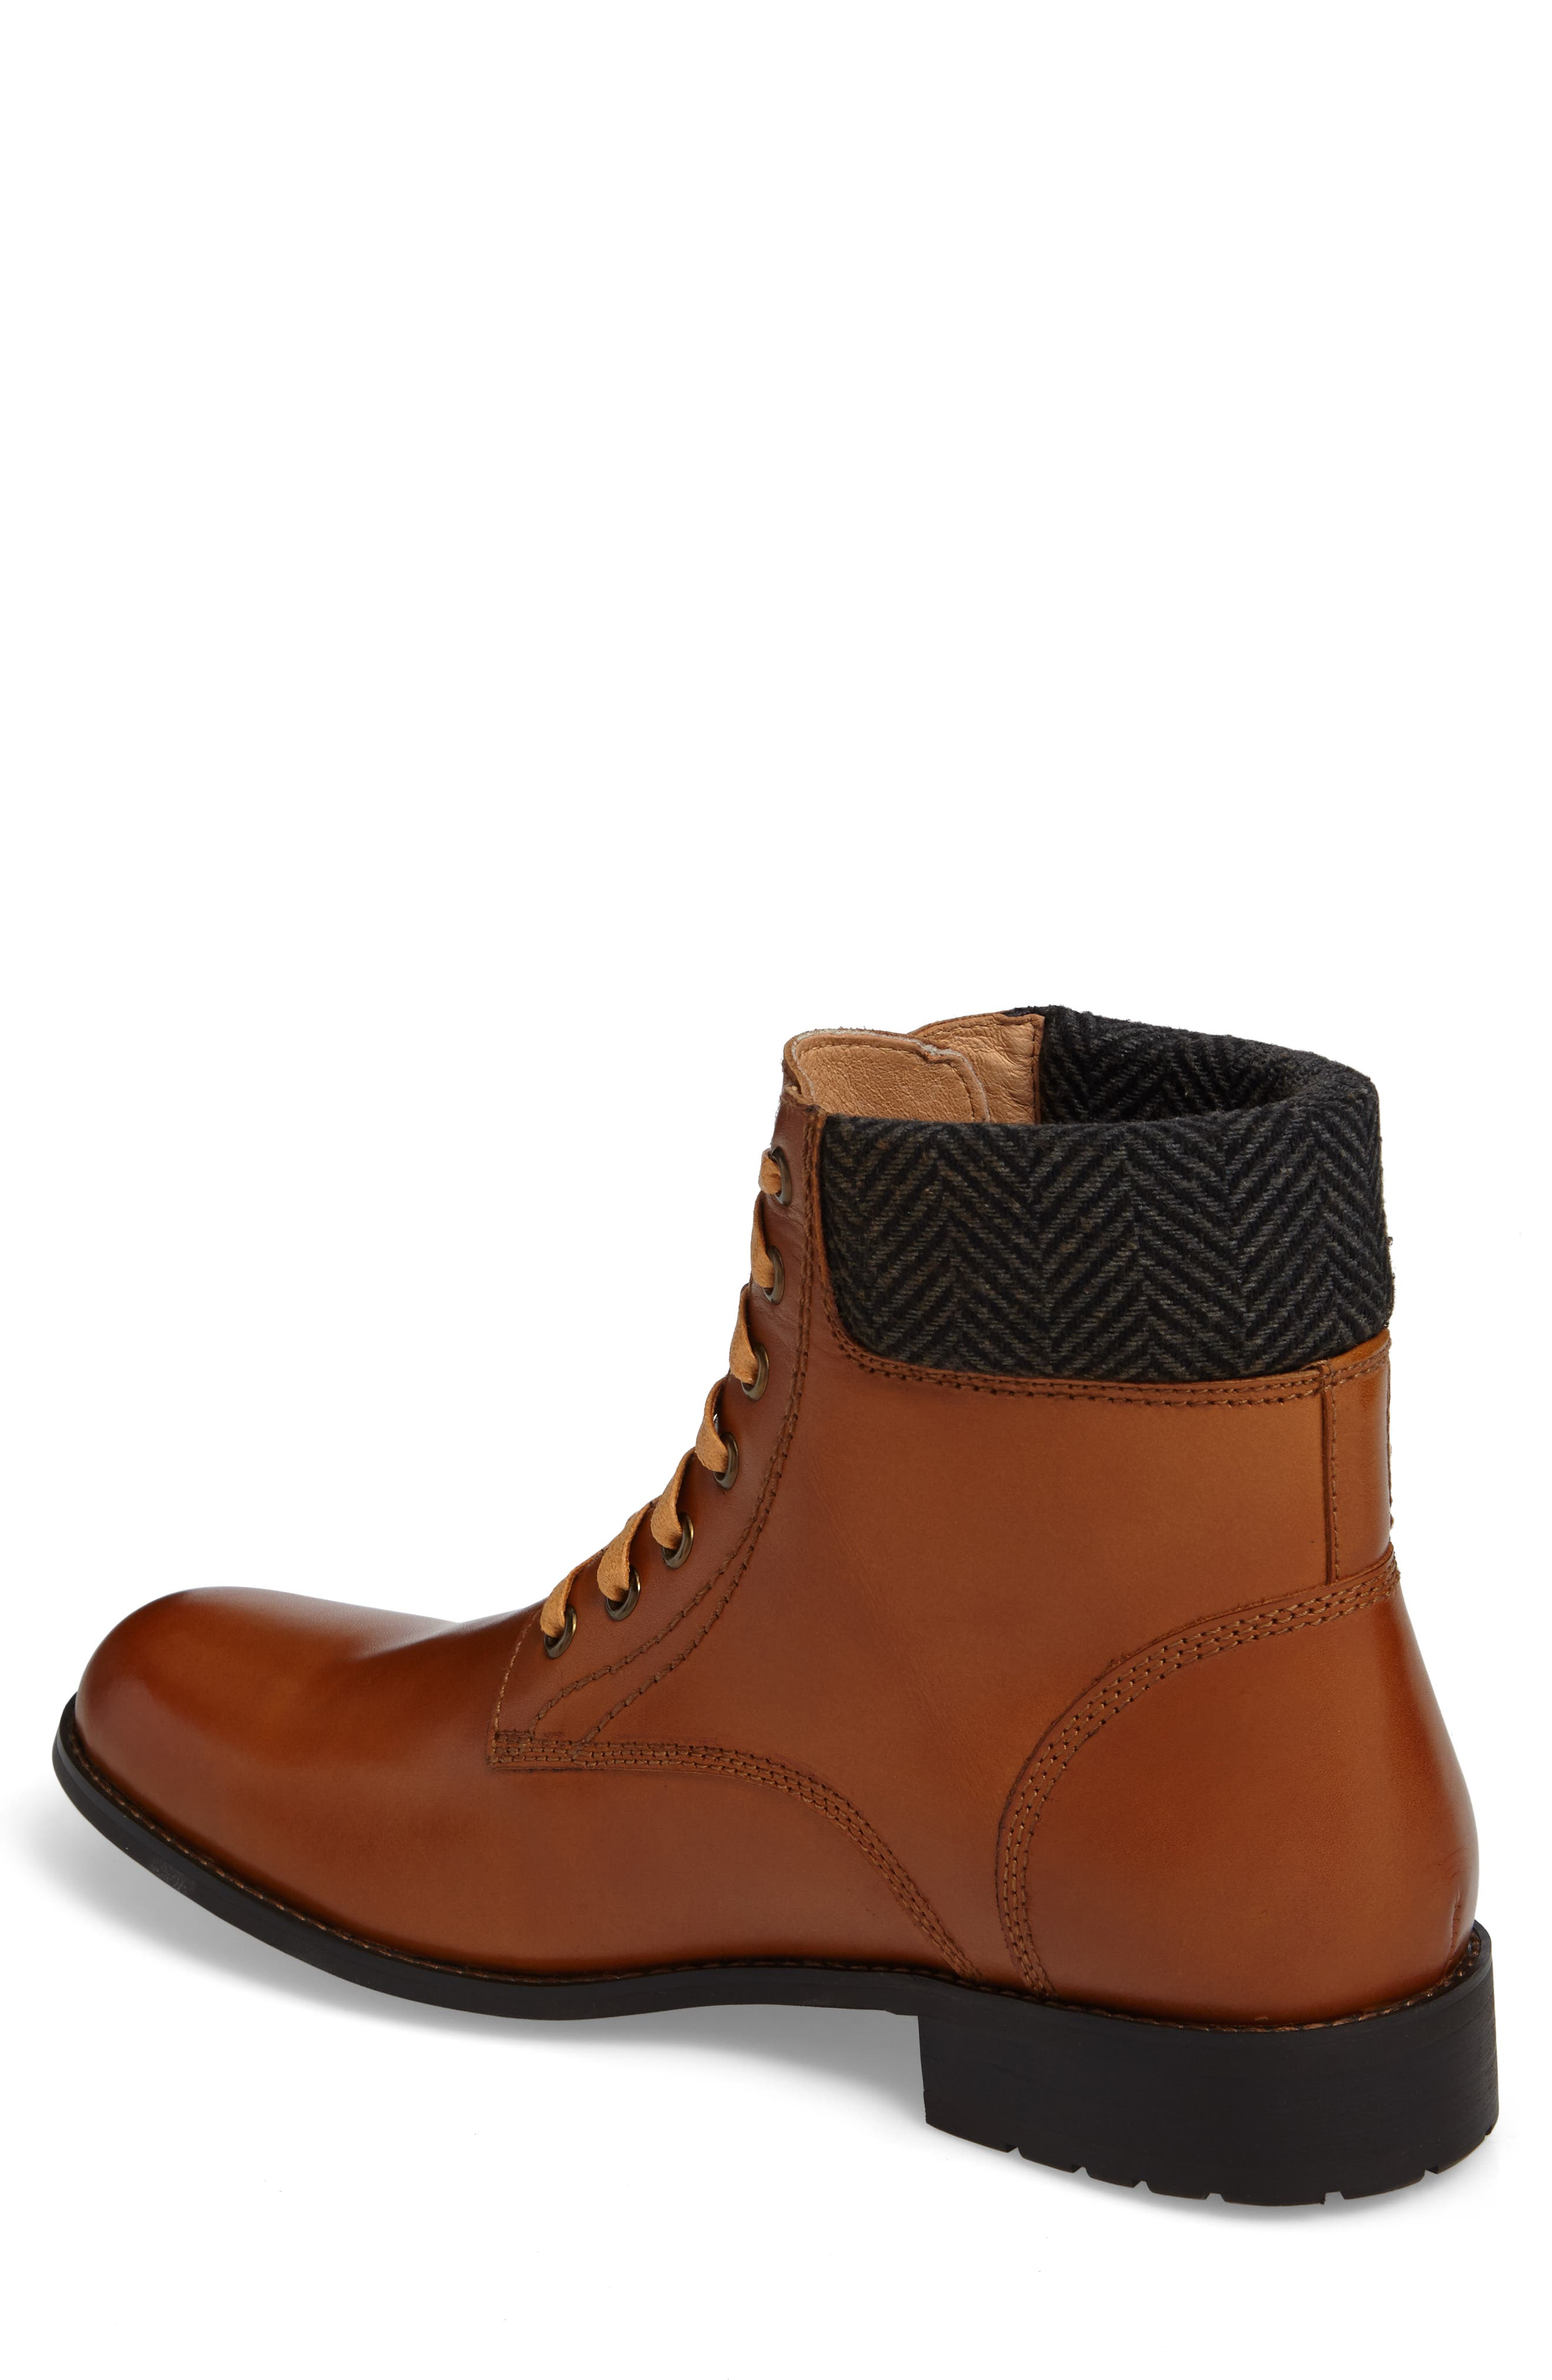 Saar Plain Toe Boot,                             Alternate thumbnail 6, color,